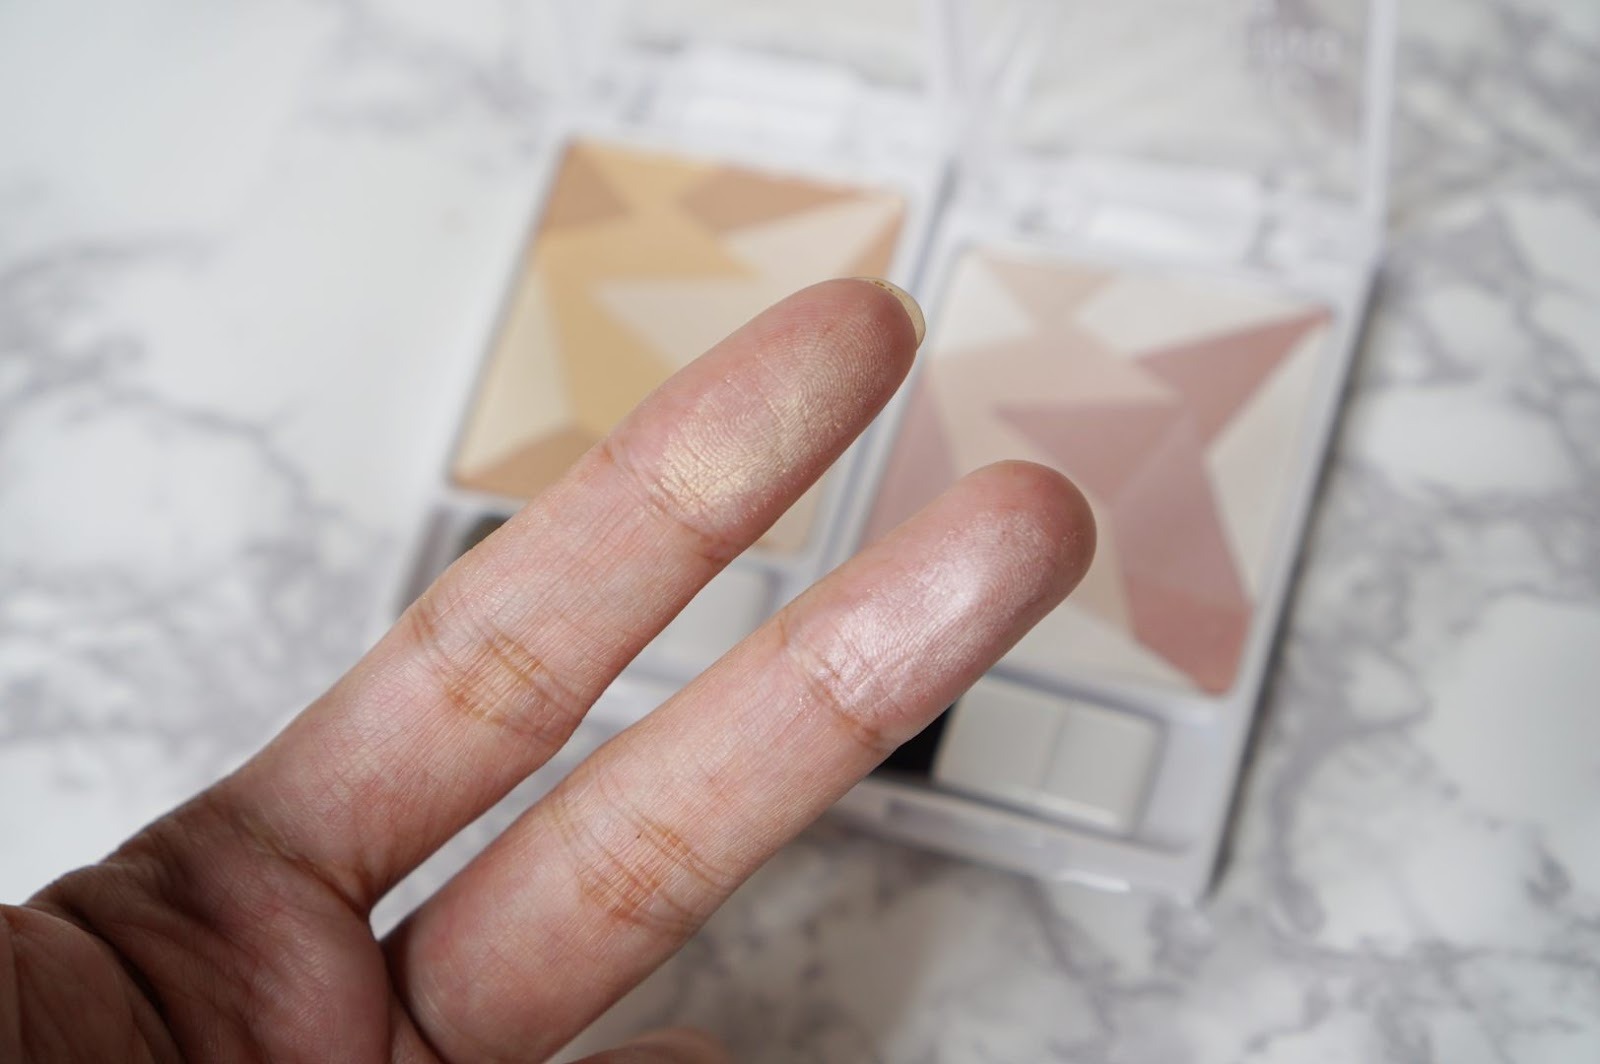 wet n wild Geometric Highlighting Powder แป้งไฮไลท์โทนสีทอง และสีชมพู ลายเรขาคณิตเก๋ ๆ